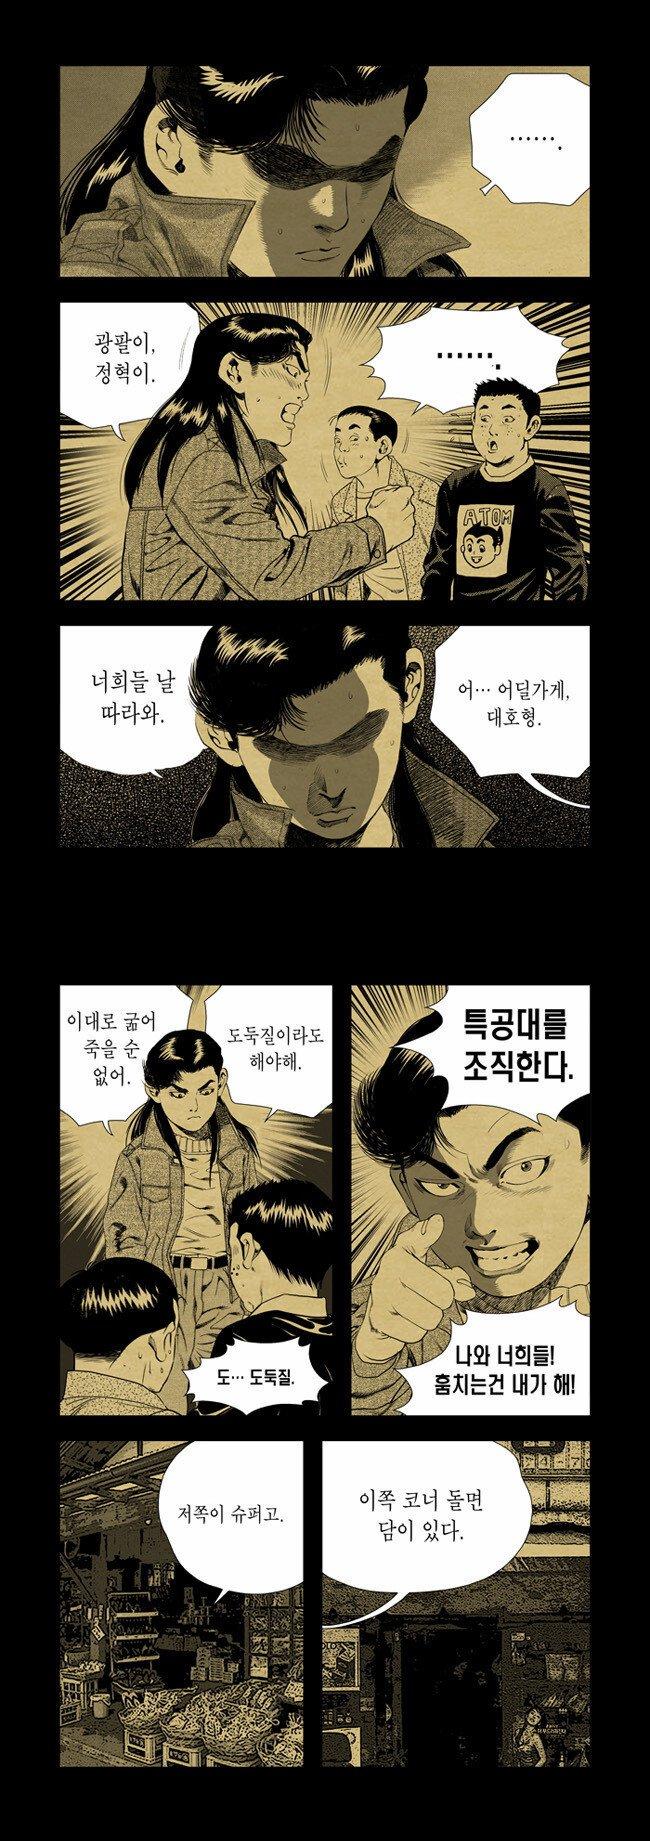 4.jpg 김성모 작품의 몰입도가 대단한 이유